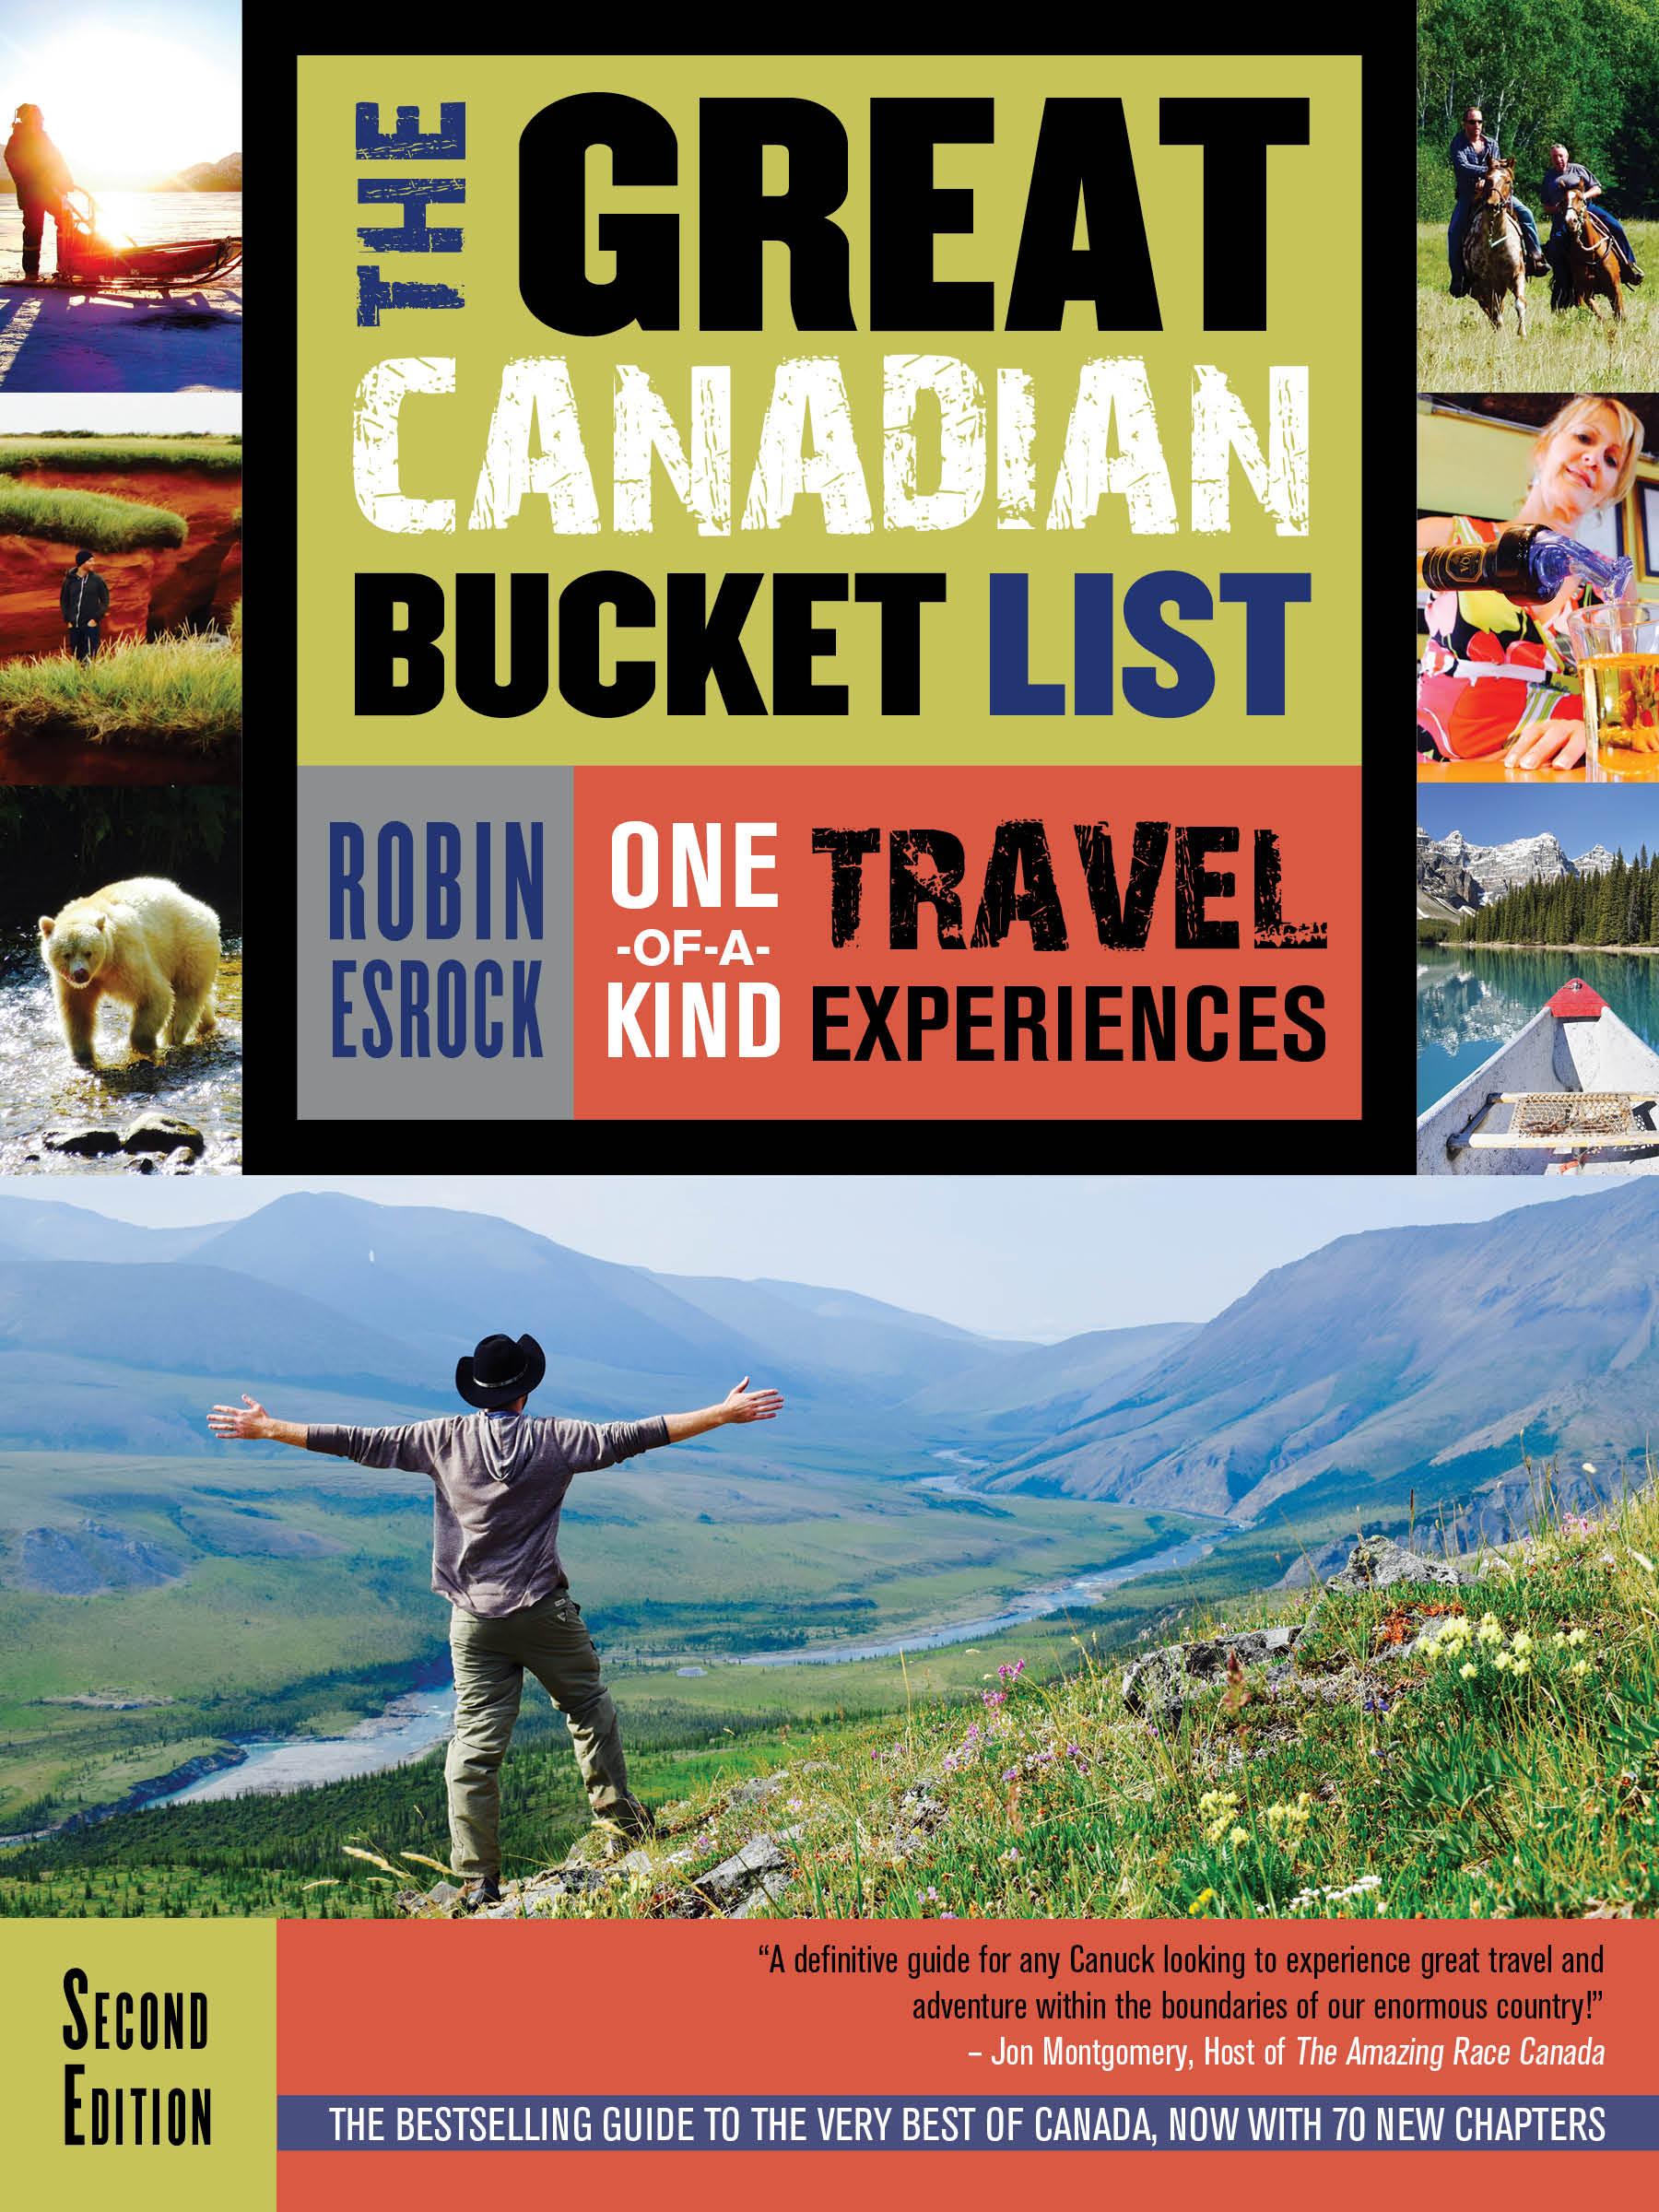 The Great Canadian Bucket List by Robin Esrock